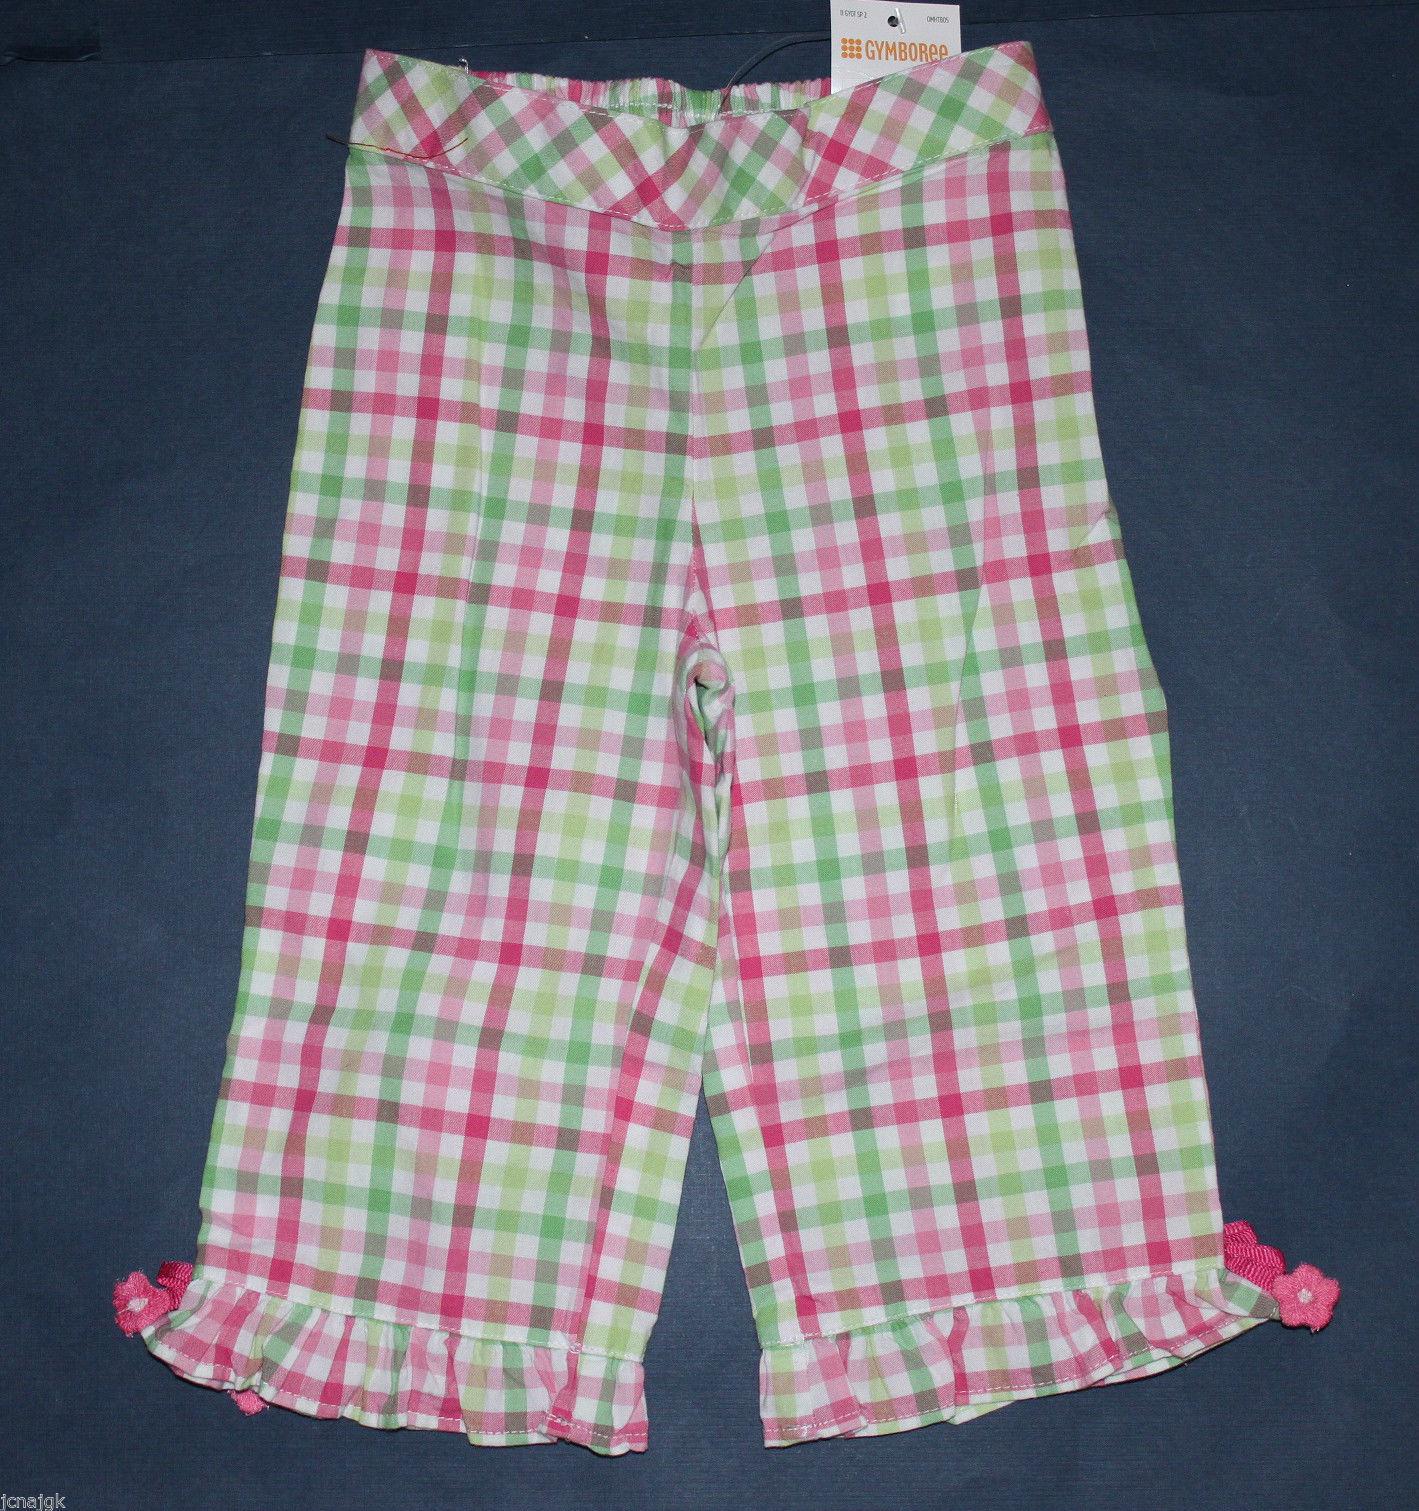 Gymboree All Ruffled Up Blue Polka Dot Pants W/ Pink Ruffles Size 6-12 Mos New Baby & Toddler Clothing Bottoms